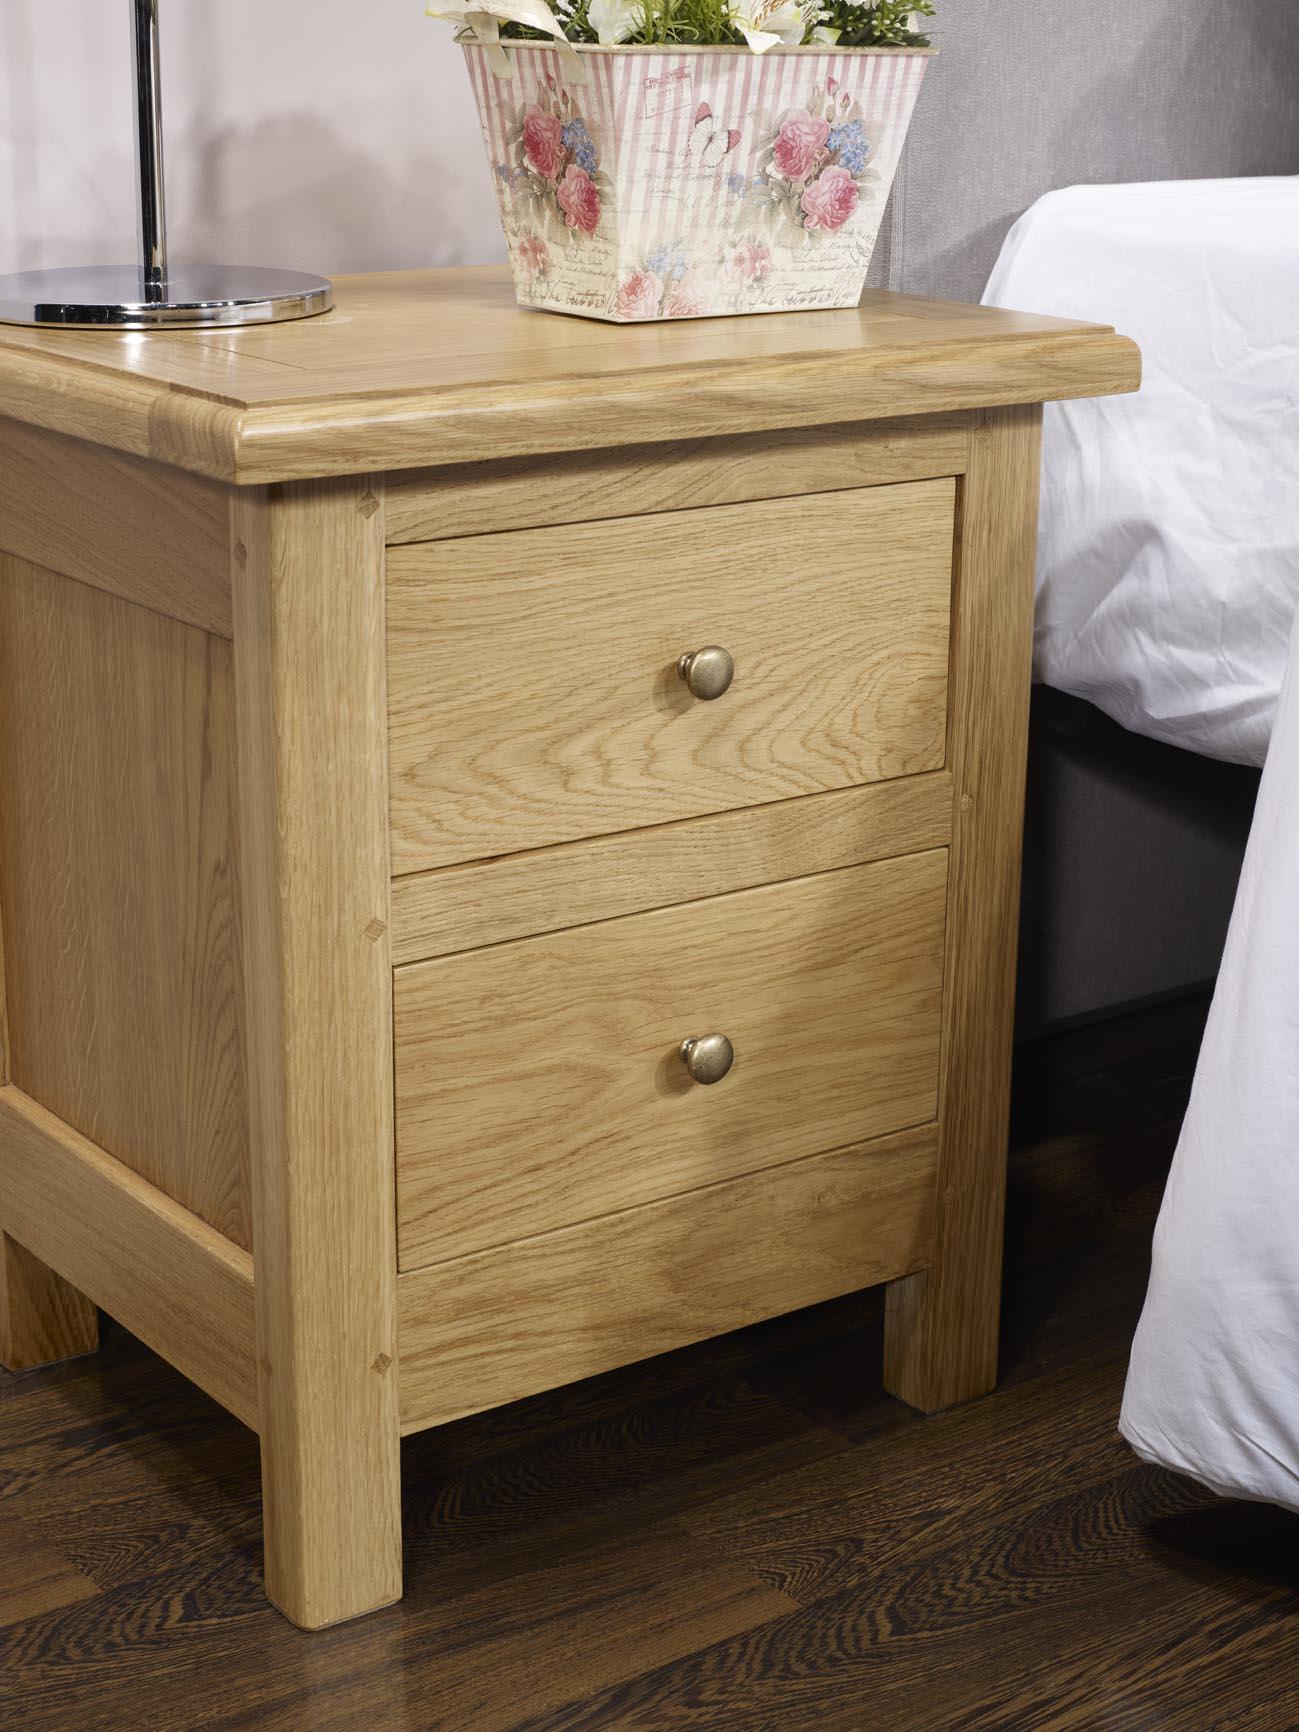 Chevet 2 tiroirs en ch ne massif de style campagne meuble en ch ne - Table style campagne ...